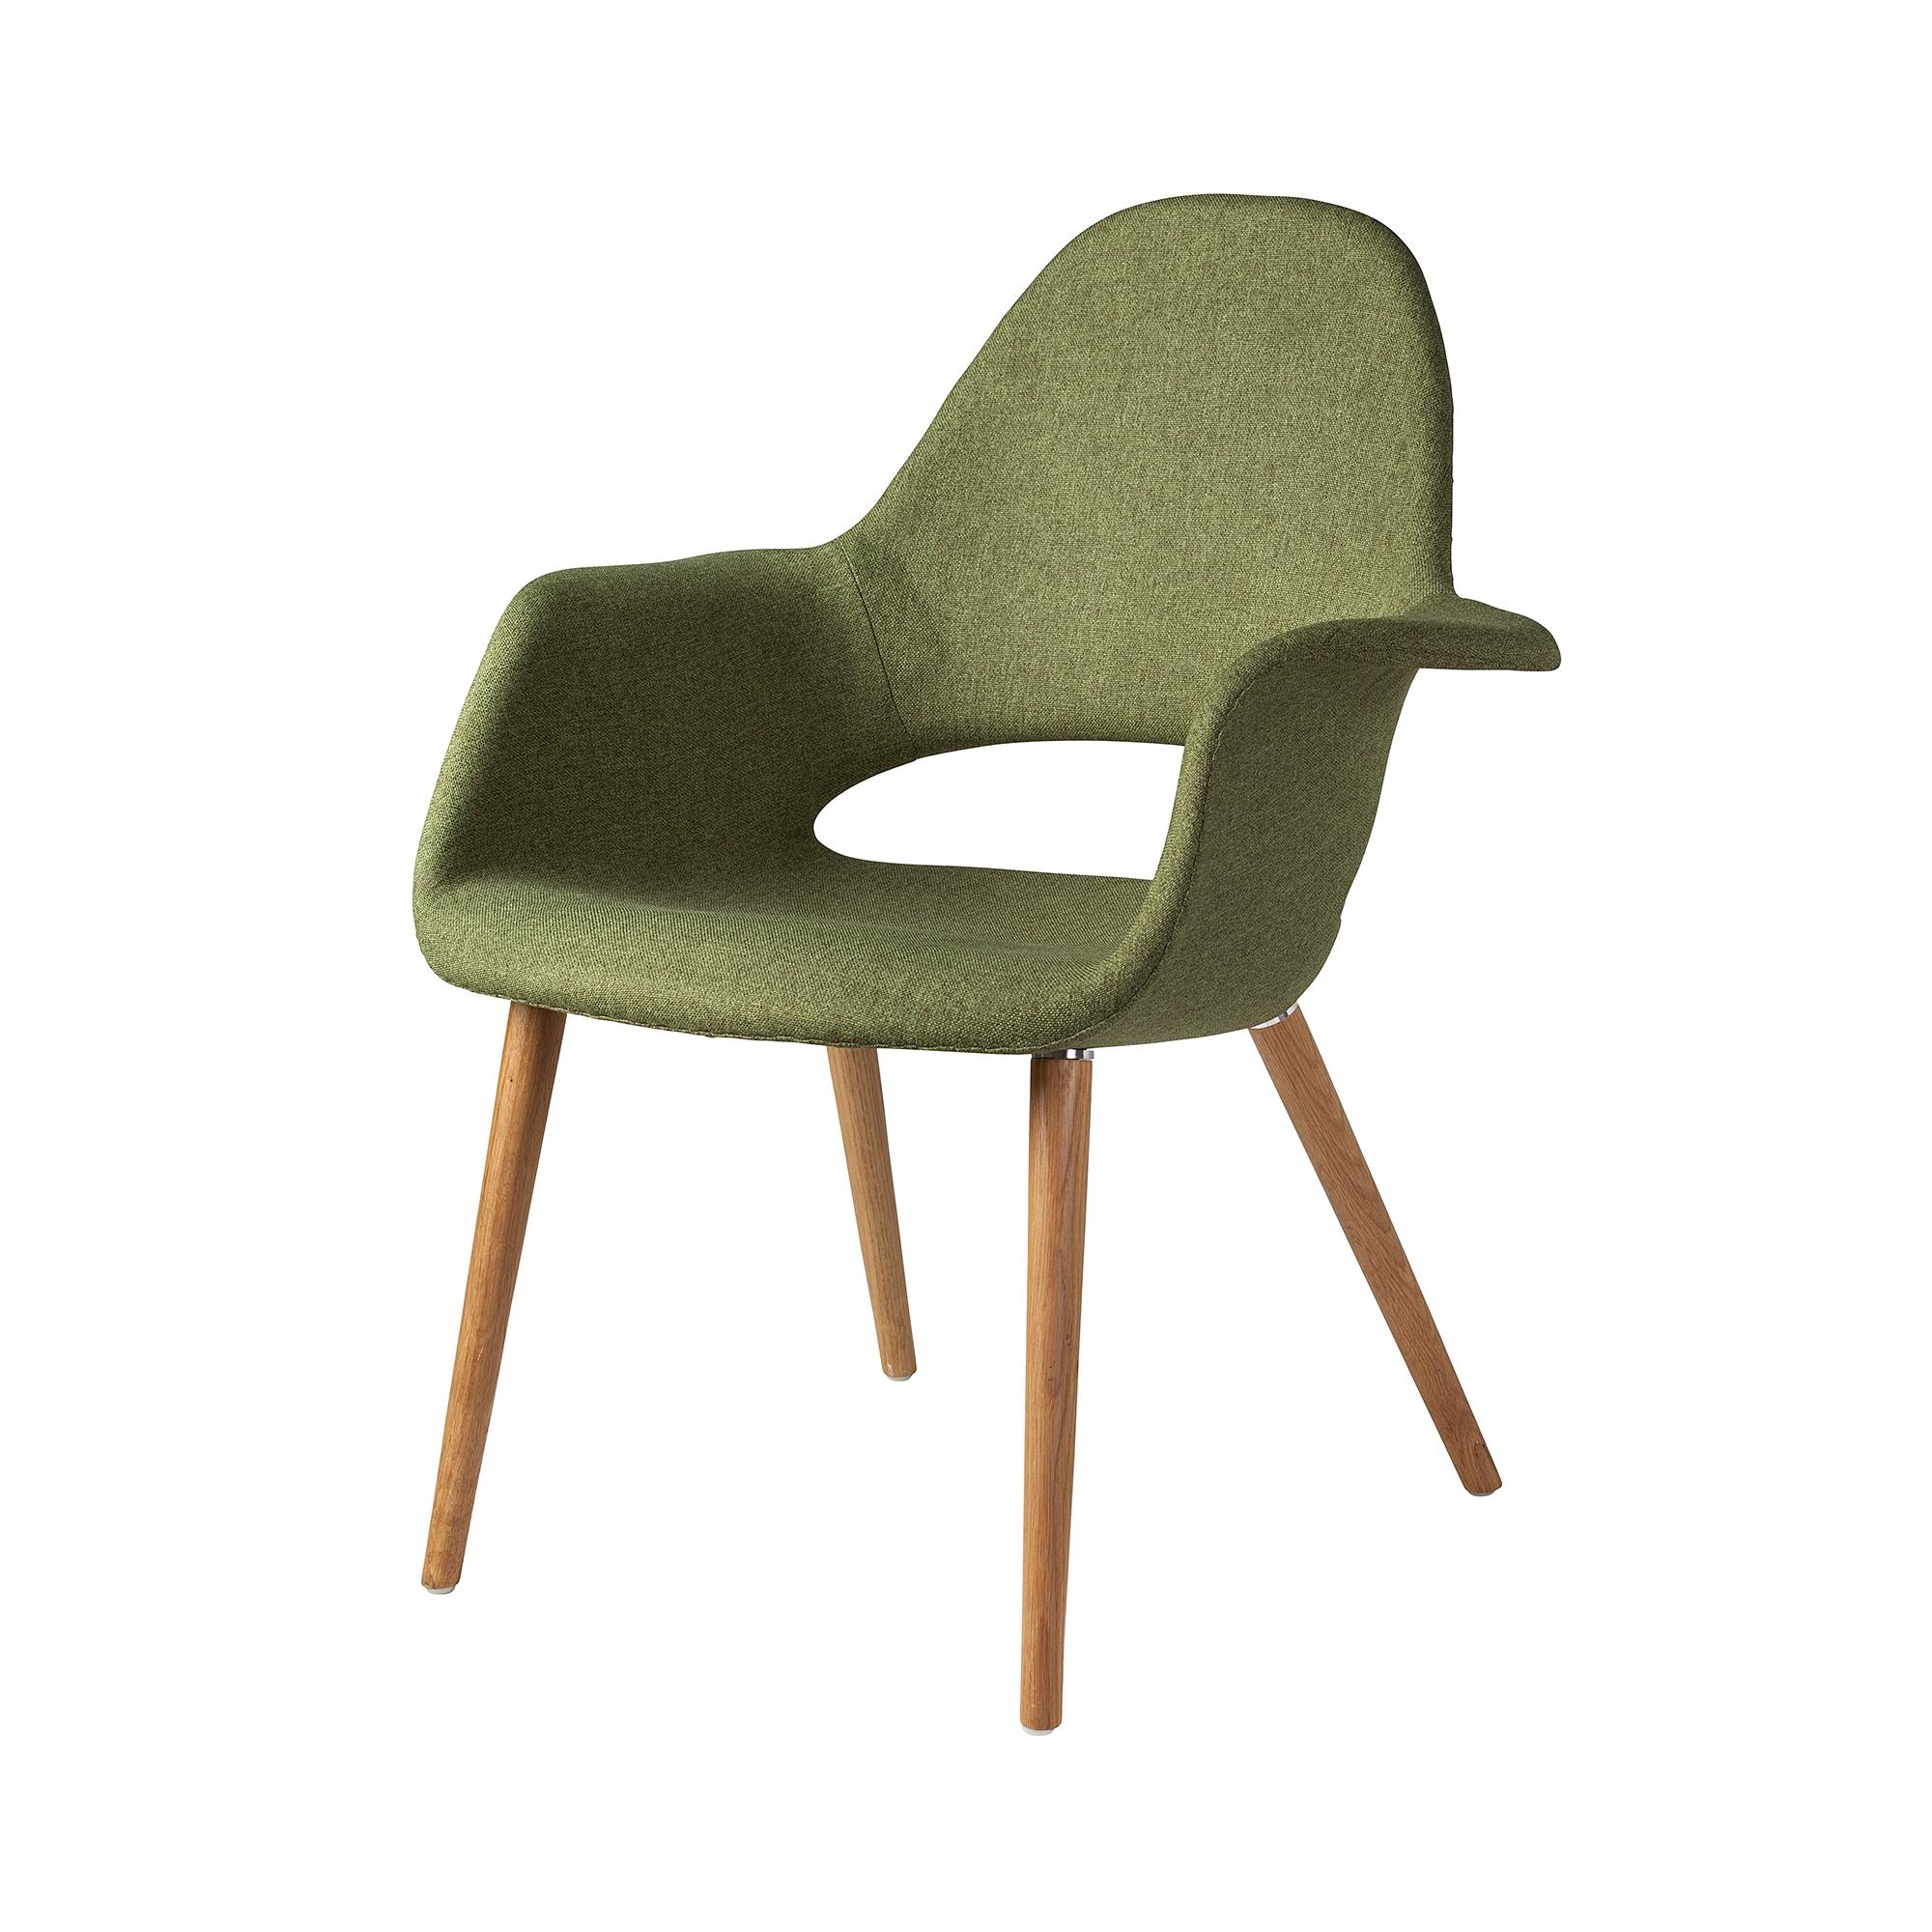 saarinen organic chair. Organic Chair Reproduction - Green Saarinen E